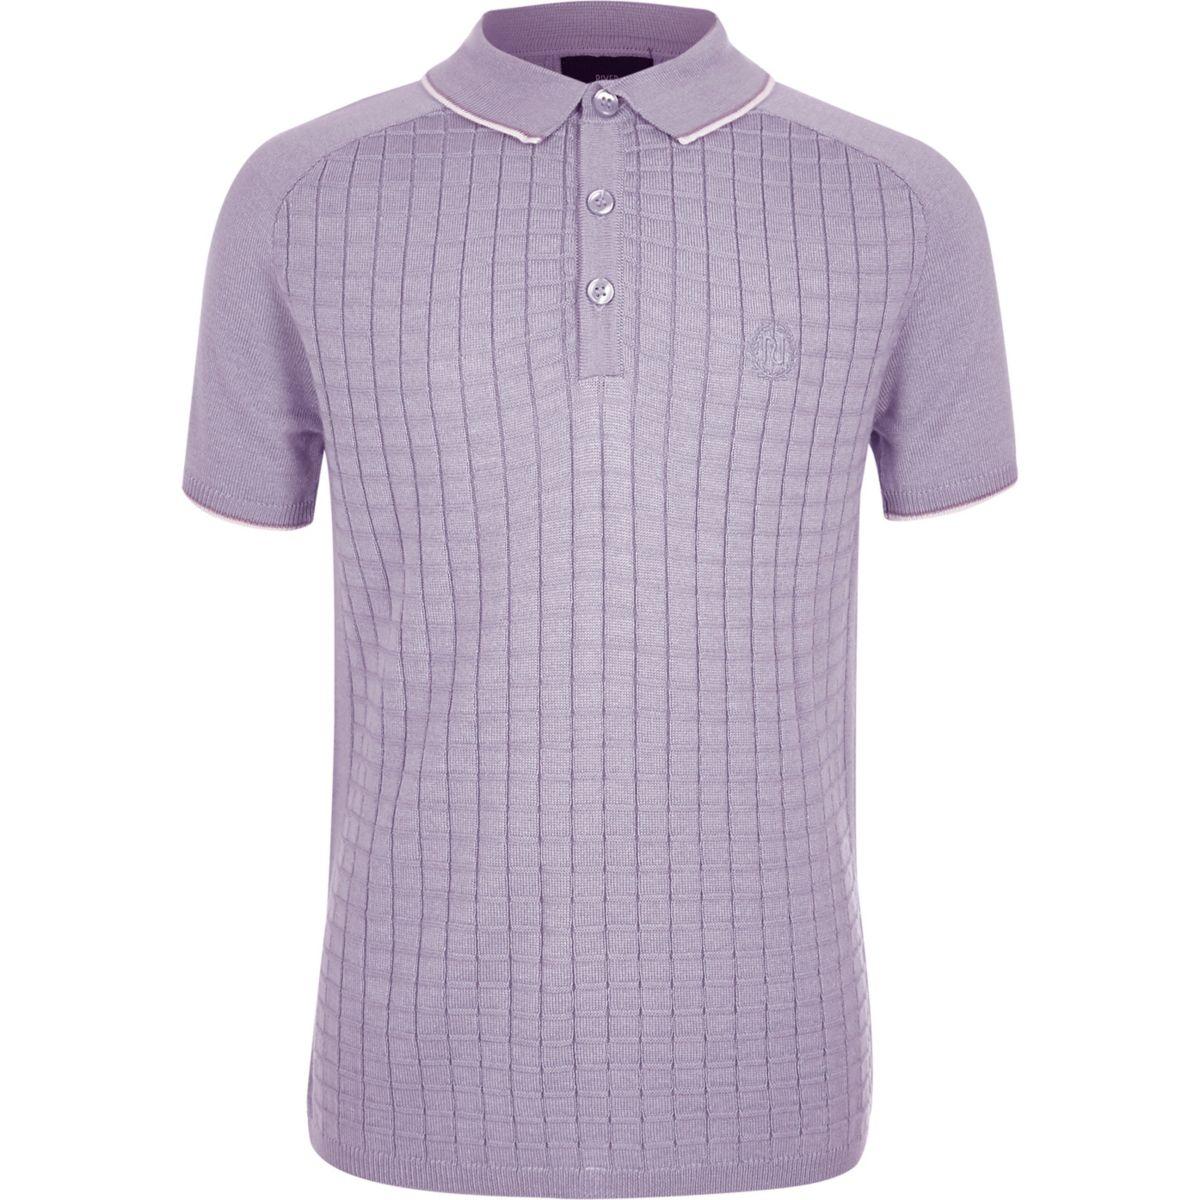 Boys purple short sleeve grid polo shirt